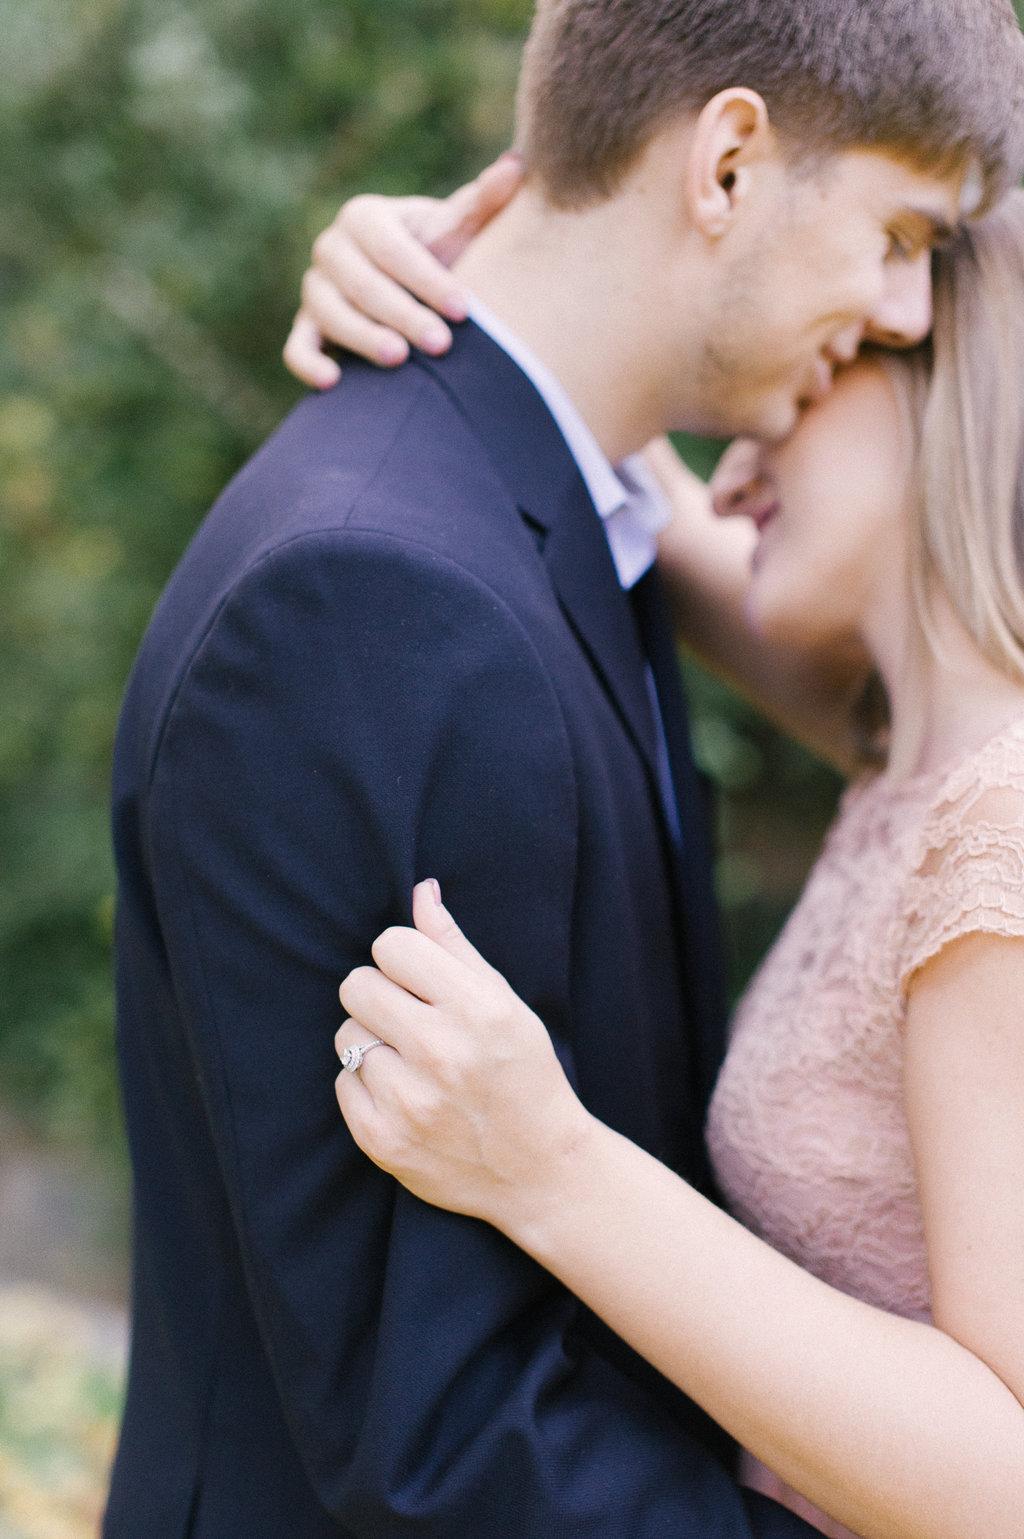 Cator-woolford-gardens-wedding-photography-hannah-forsberg-atlanta-5.jpg